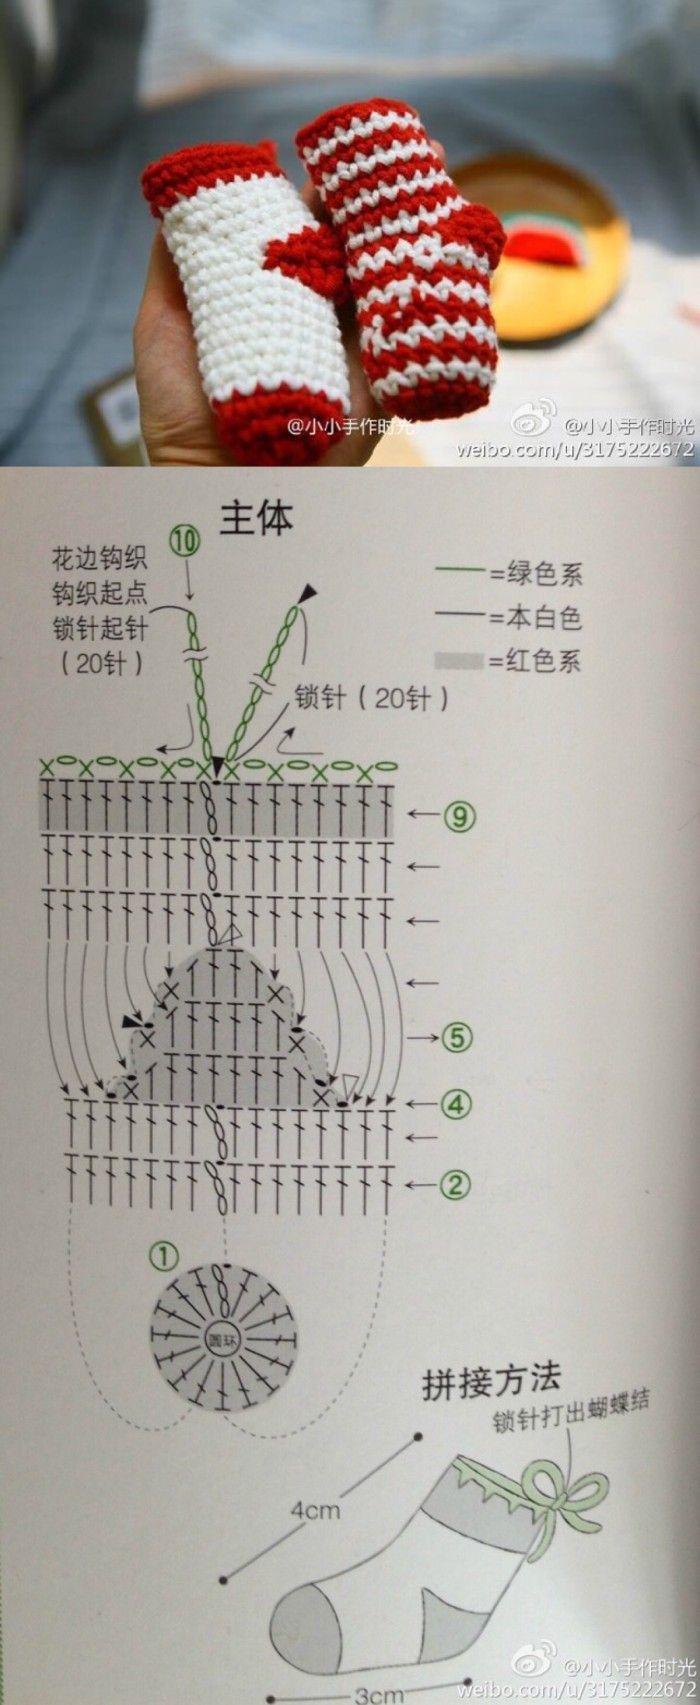 Pin de catherine micault en diagramme crochet | Pinterest | Bebe ...